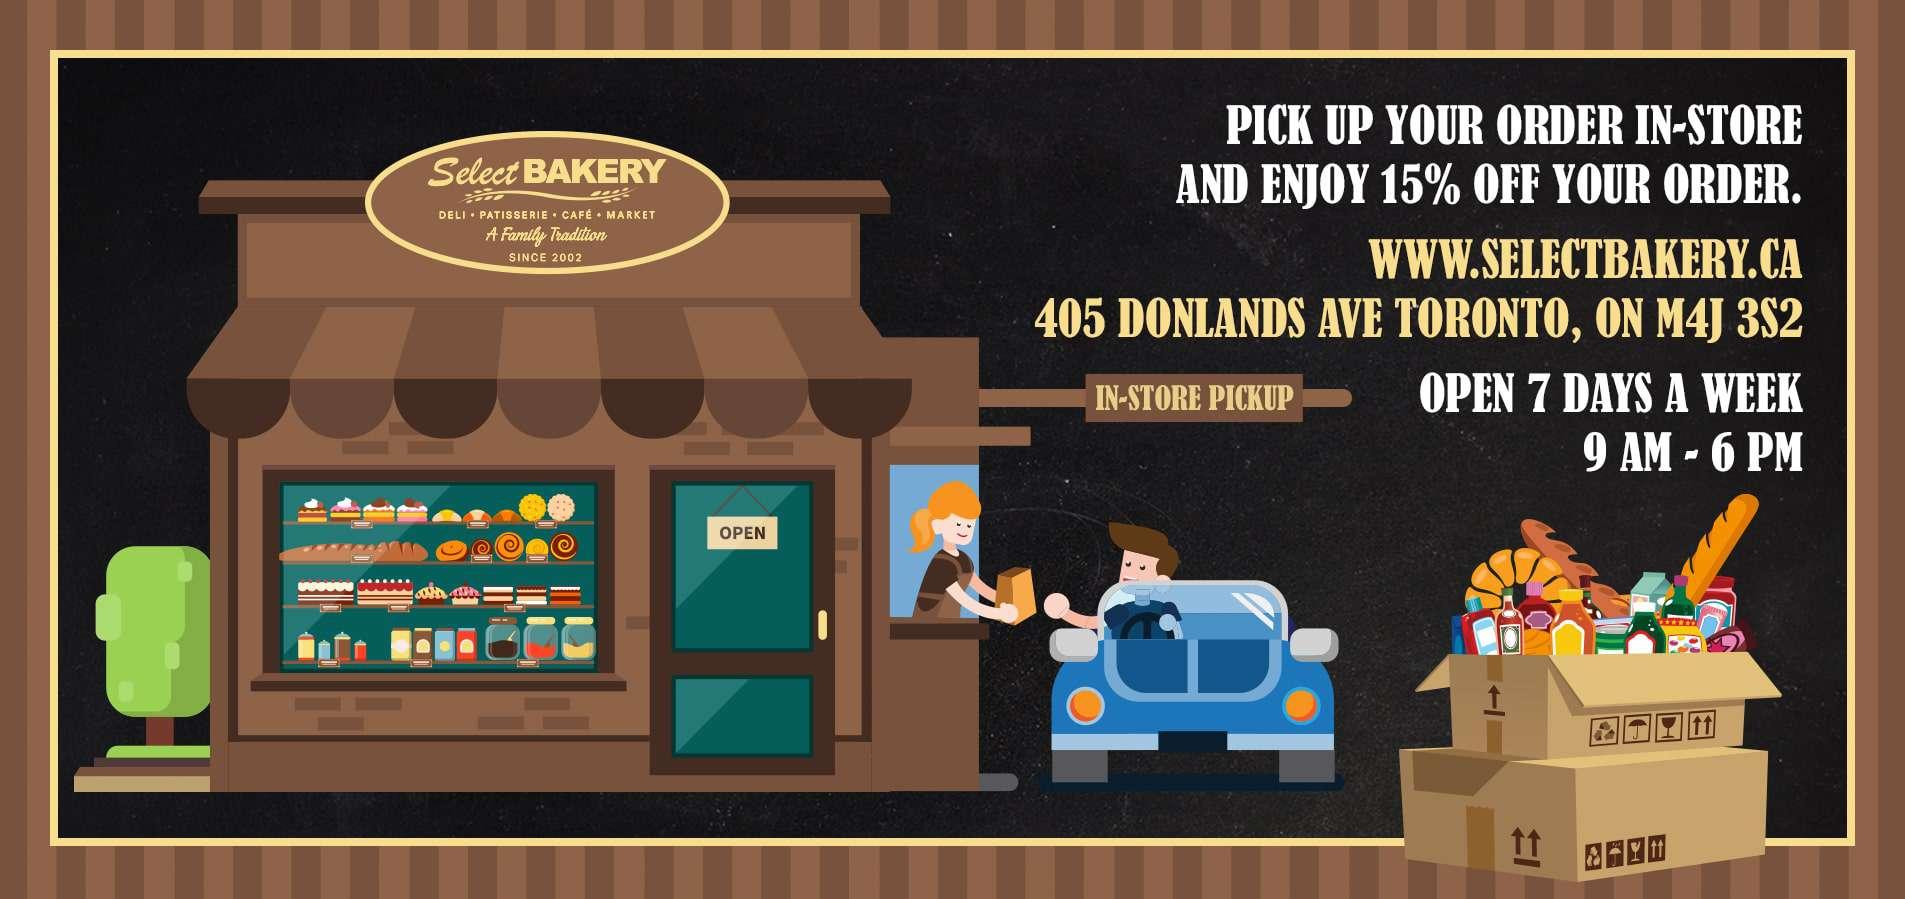 Select-Bakery-Toronto-Pick-Up